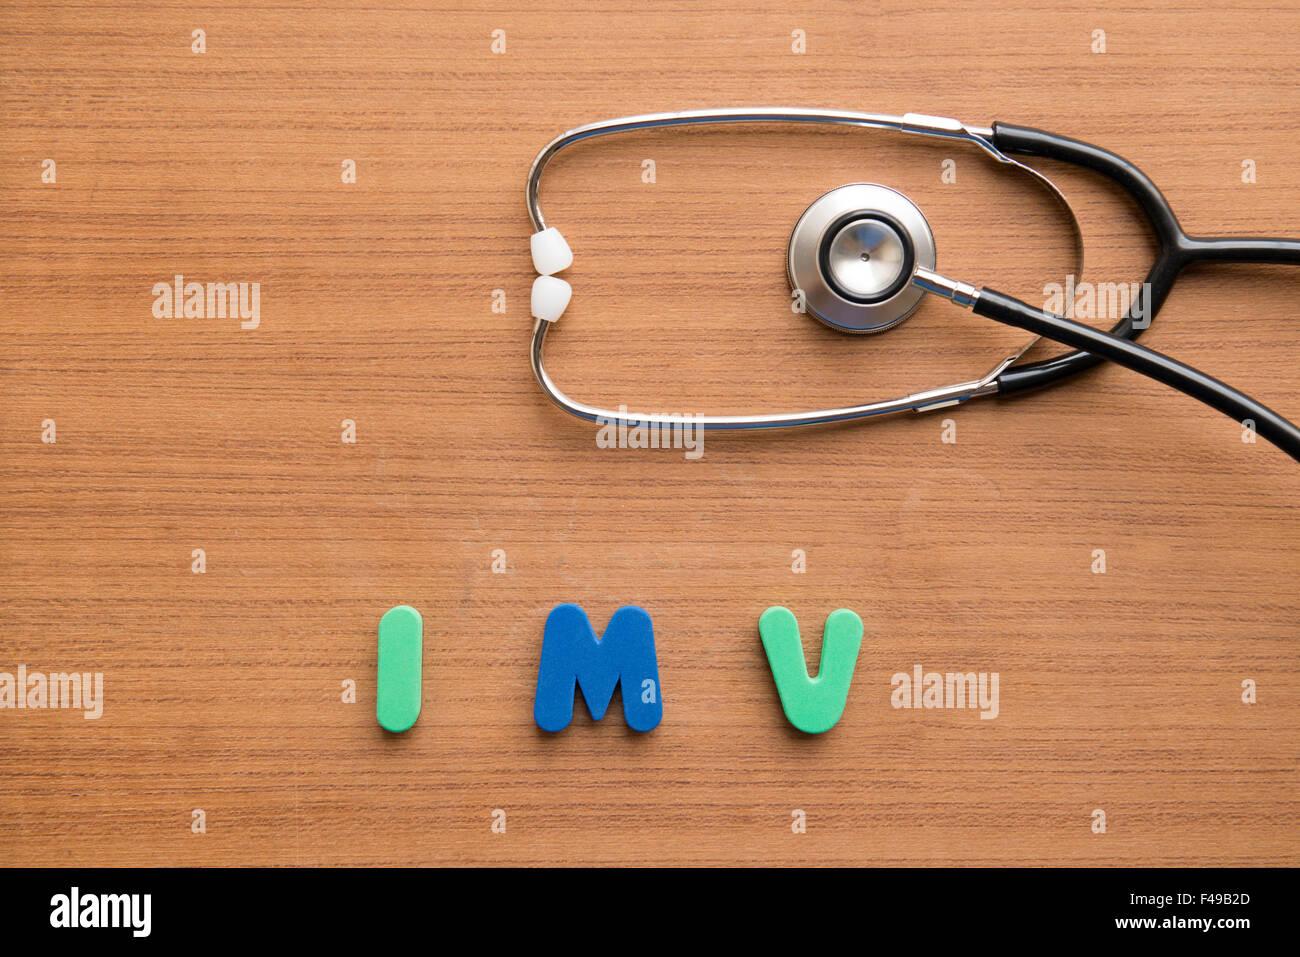 Intermittent mandatory ventilation (IMV) - Stock Image